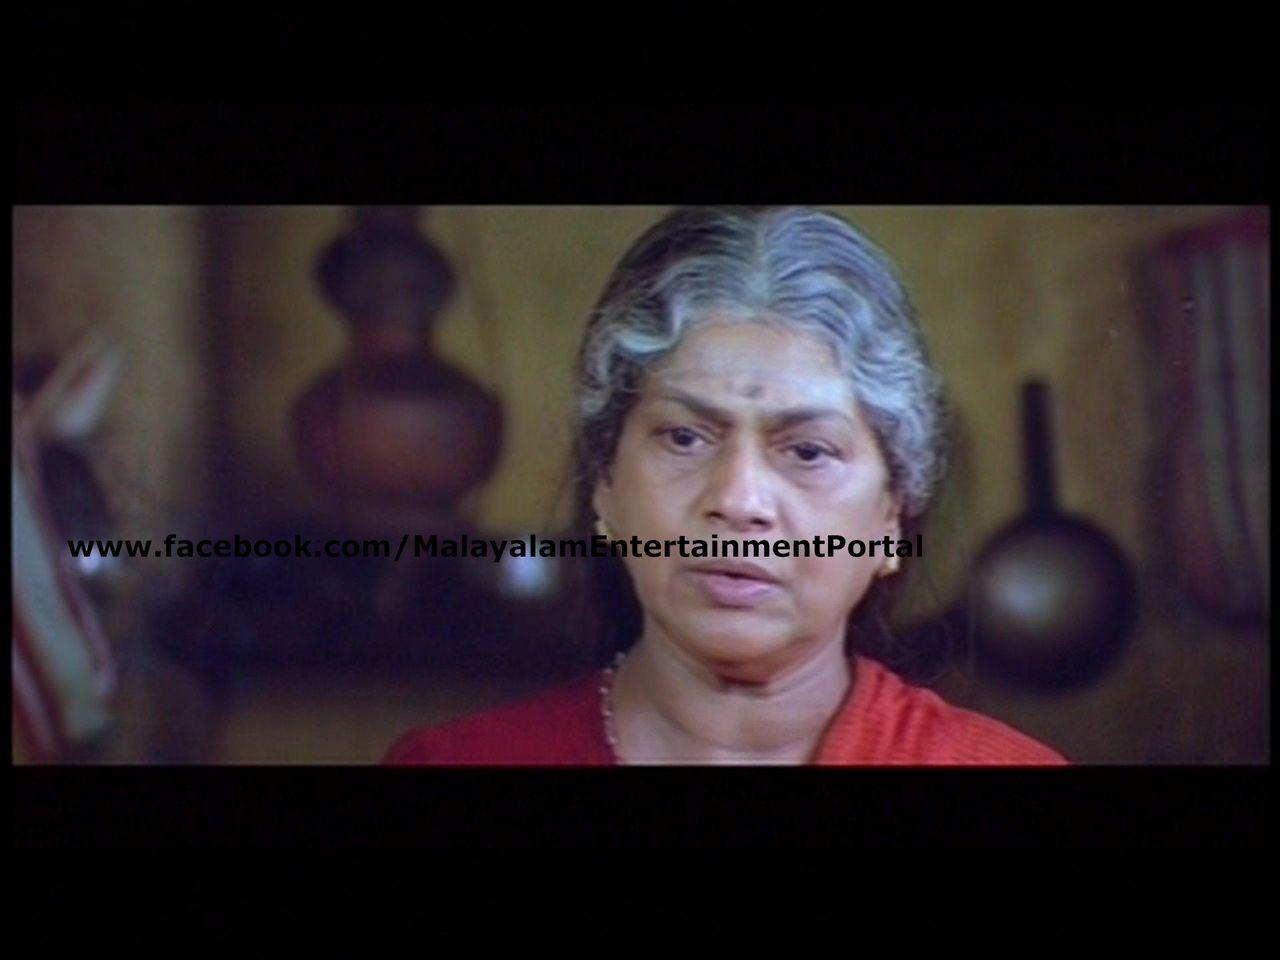 Rakshasarajavu DVD Screenshots (Saina) Bscap0026